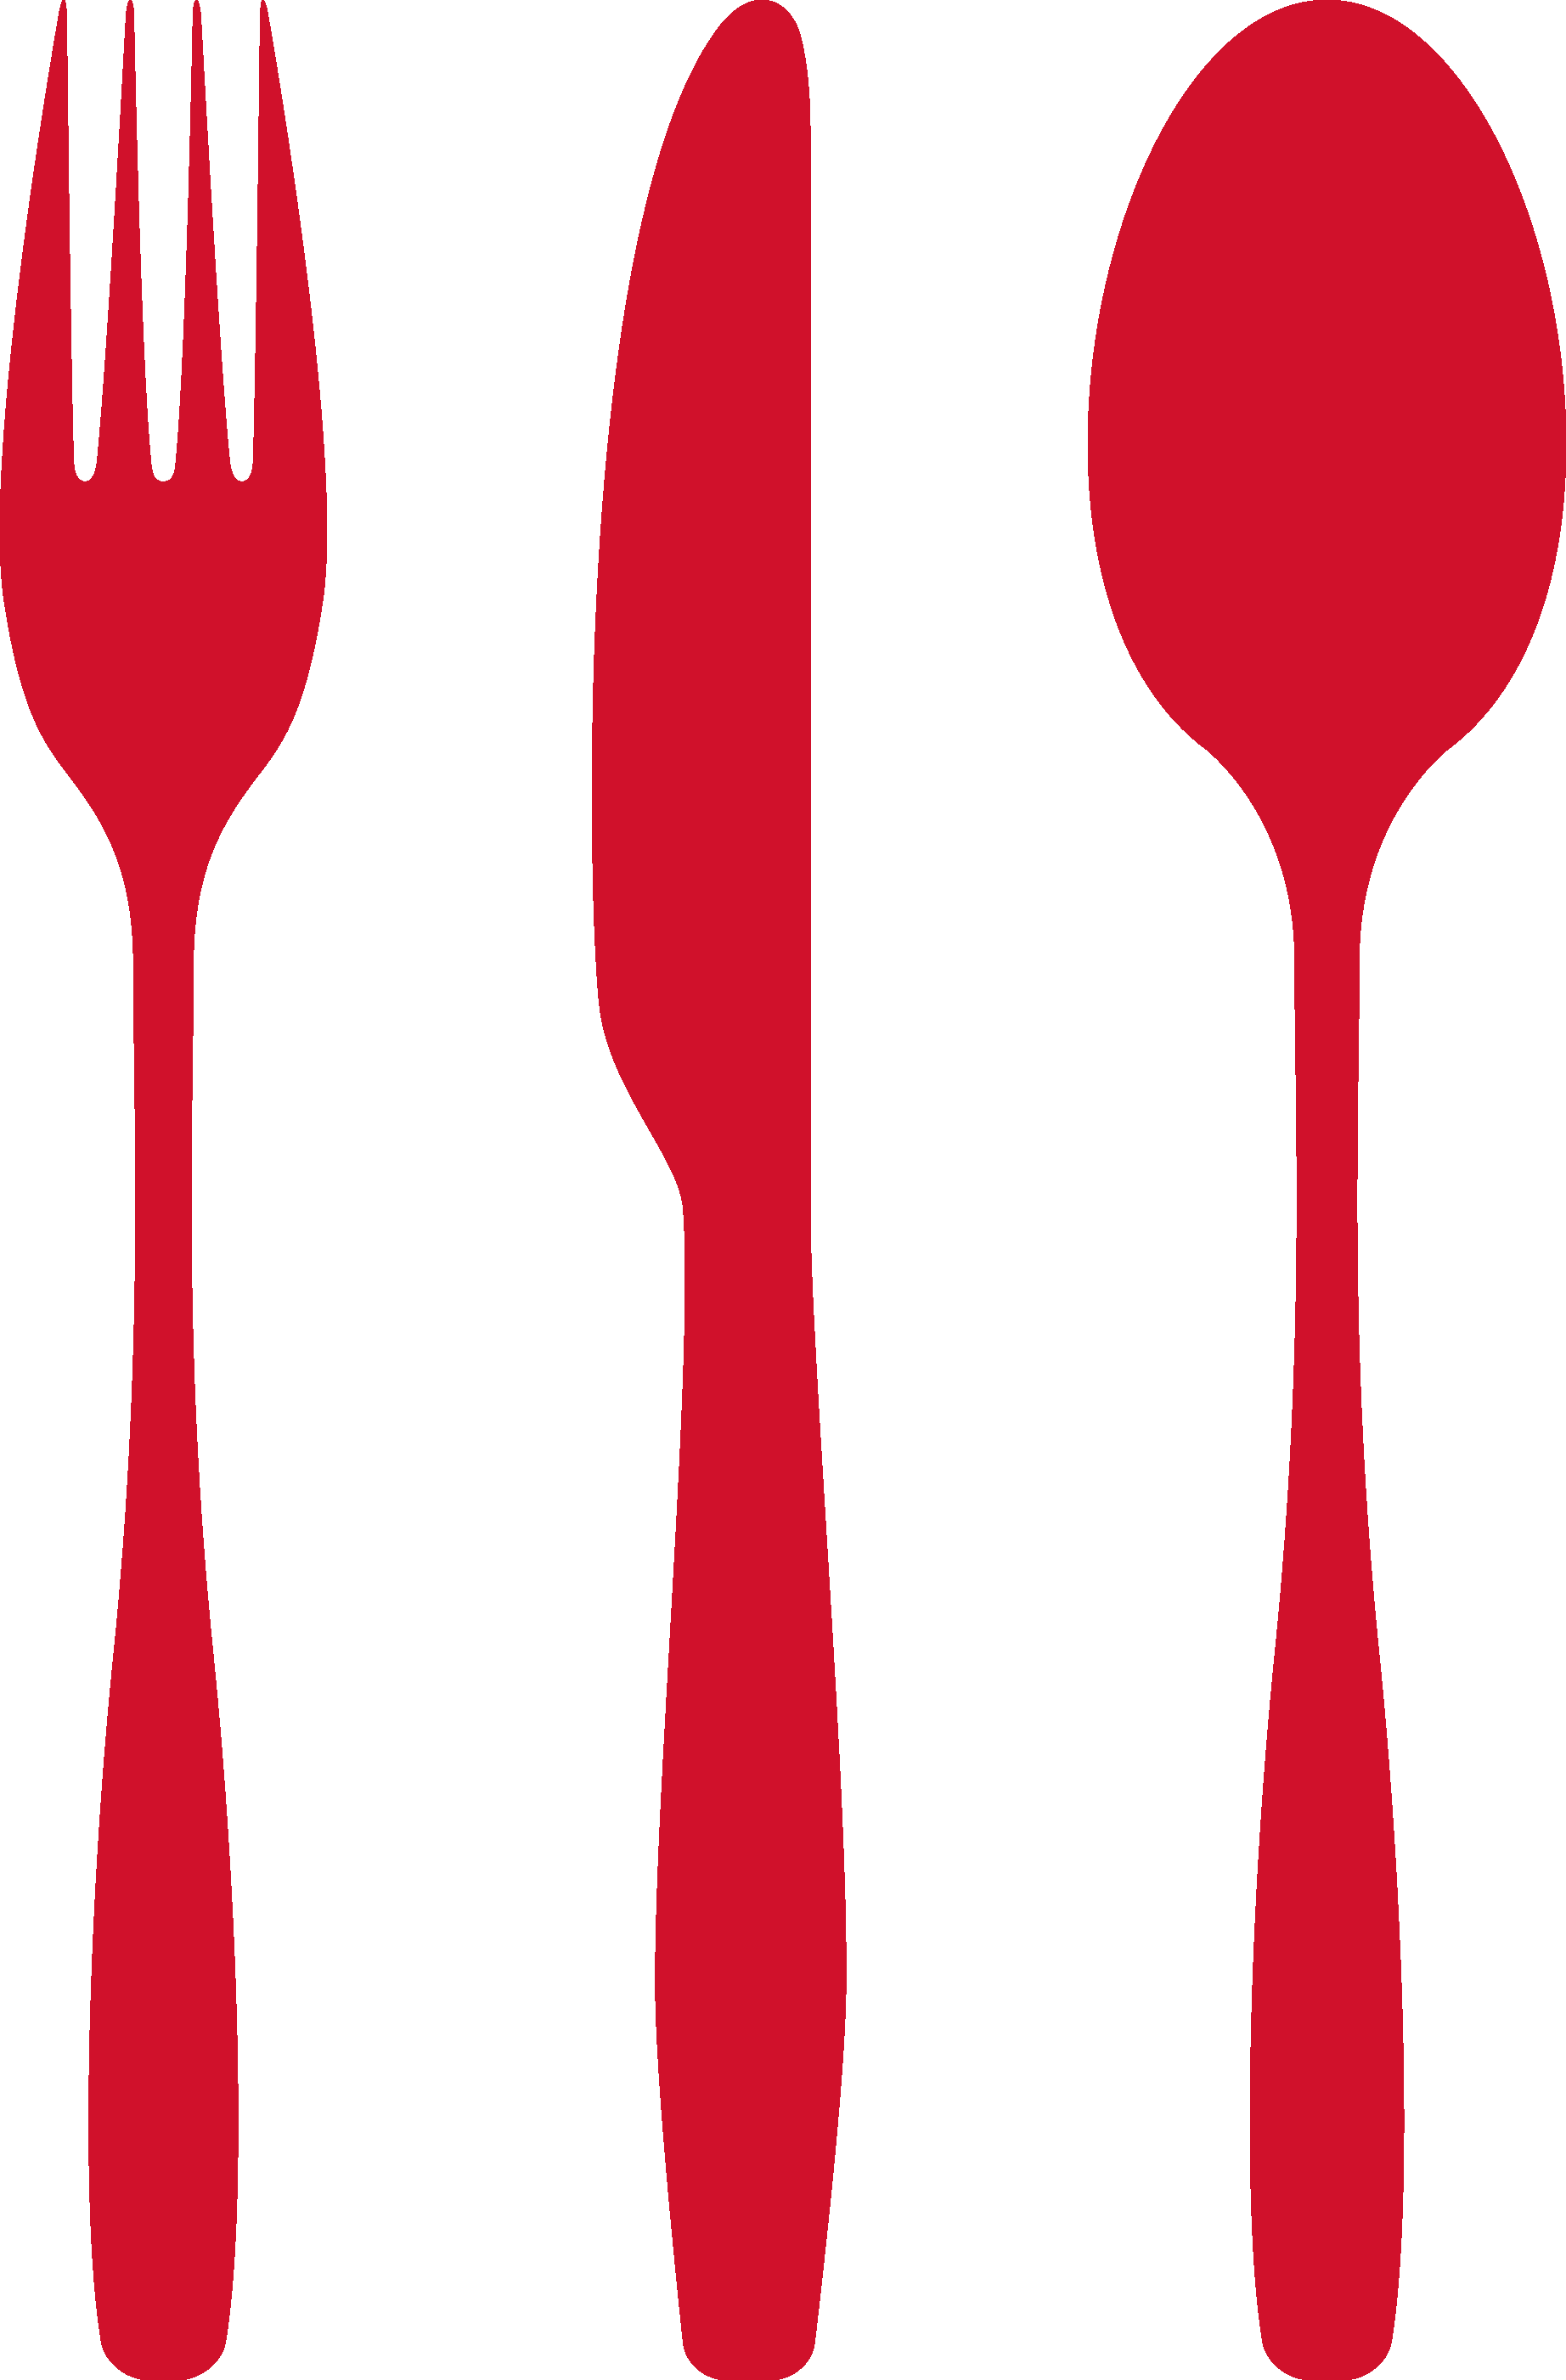 Clipart kitchen producer. Food beverage service insurance